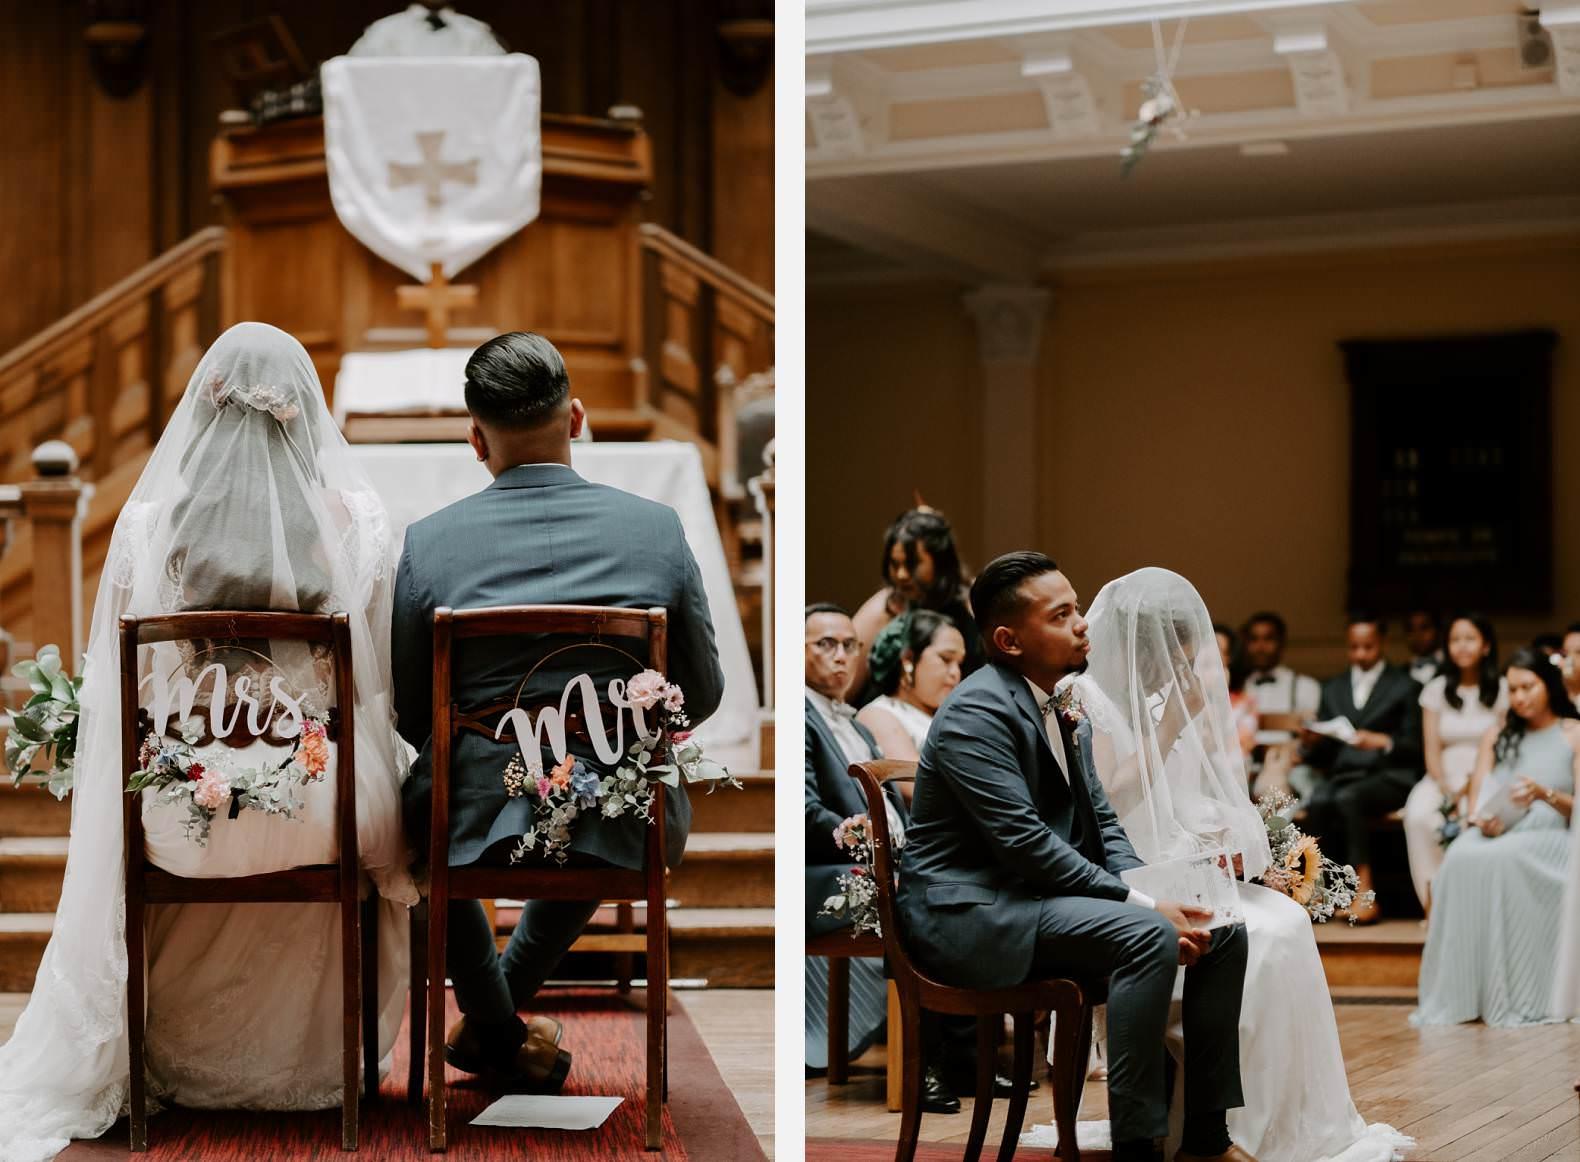 mariage manoir de corny photographe bel esprit 0025 1